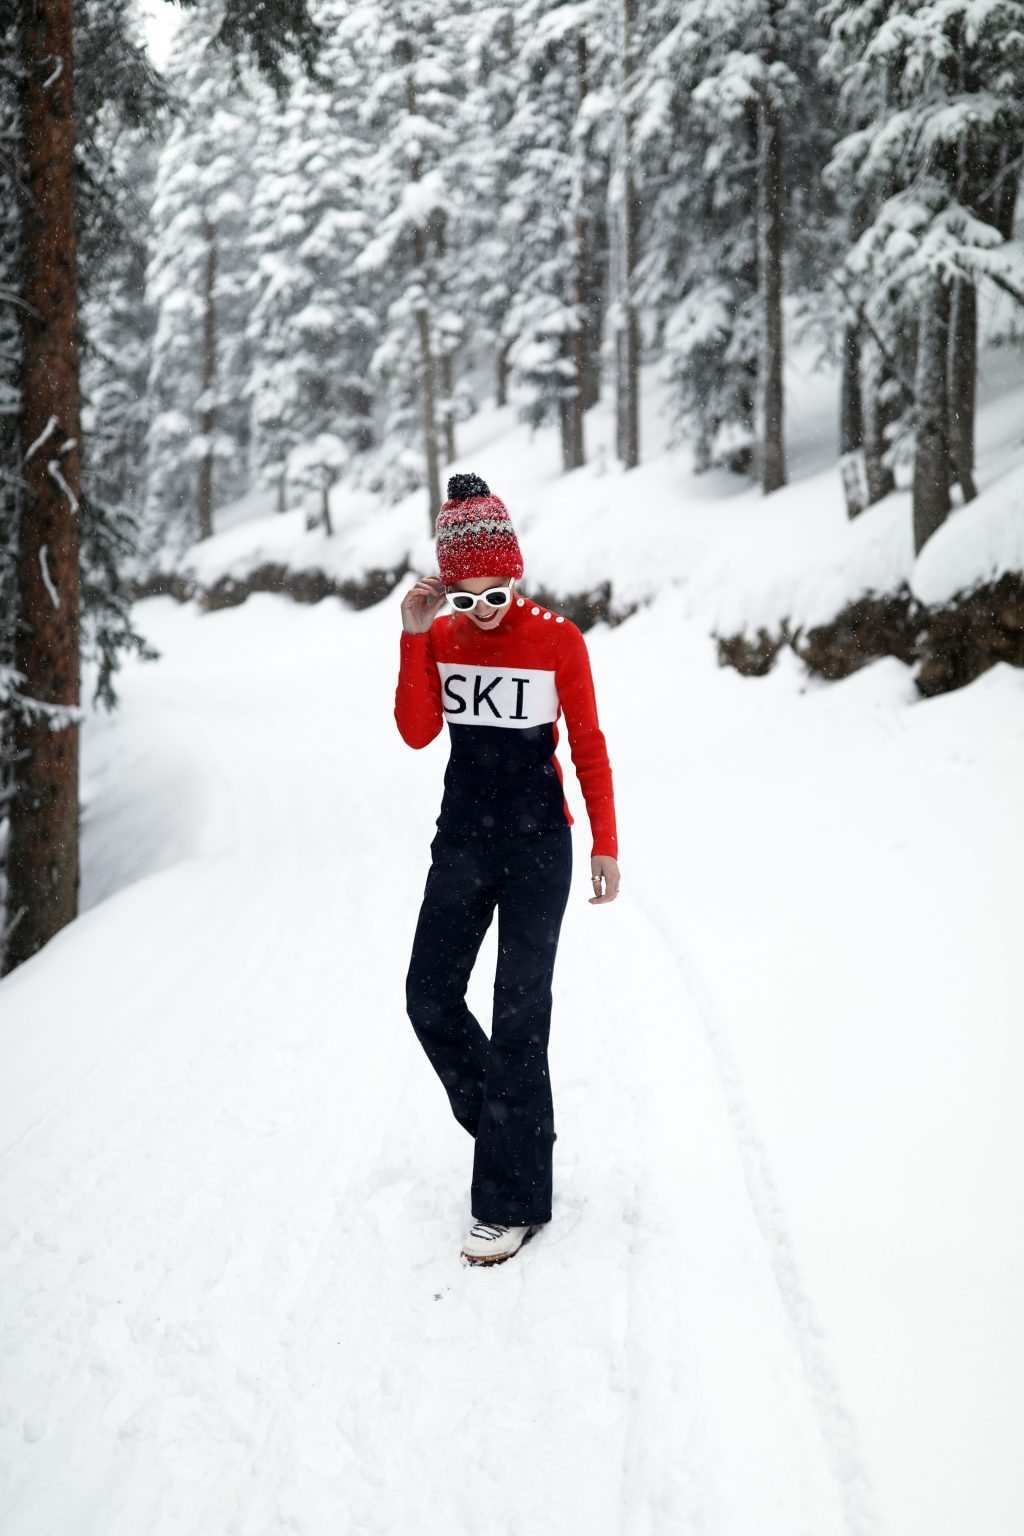 blair-eadie-atlantic-pacific-ski-moncler-trip-colorado-aspen-nyc-red-white-blue-outfit-holidays-polo-st-regis-moncler